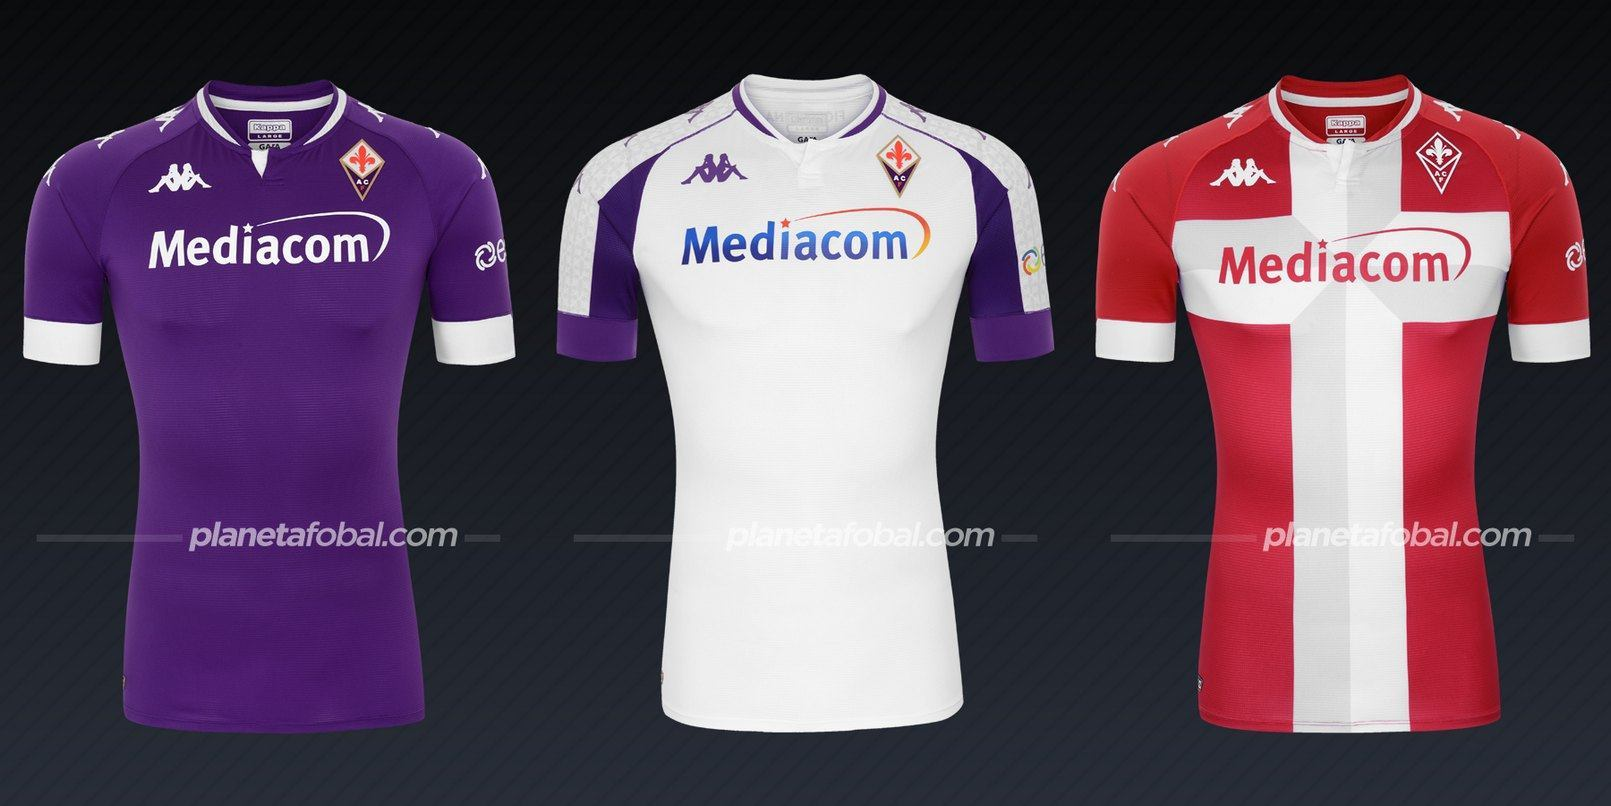 Fiorentina (Kappa) | Camisetas de la Serie A 2020/2021